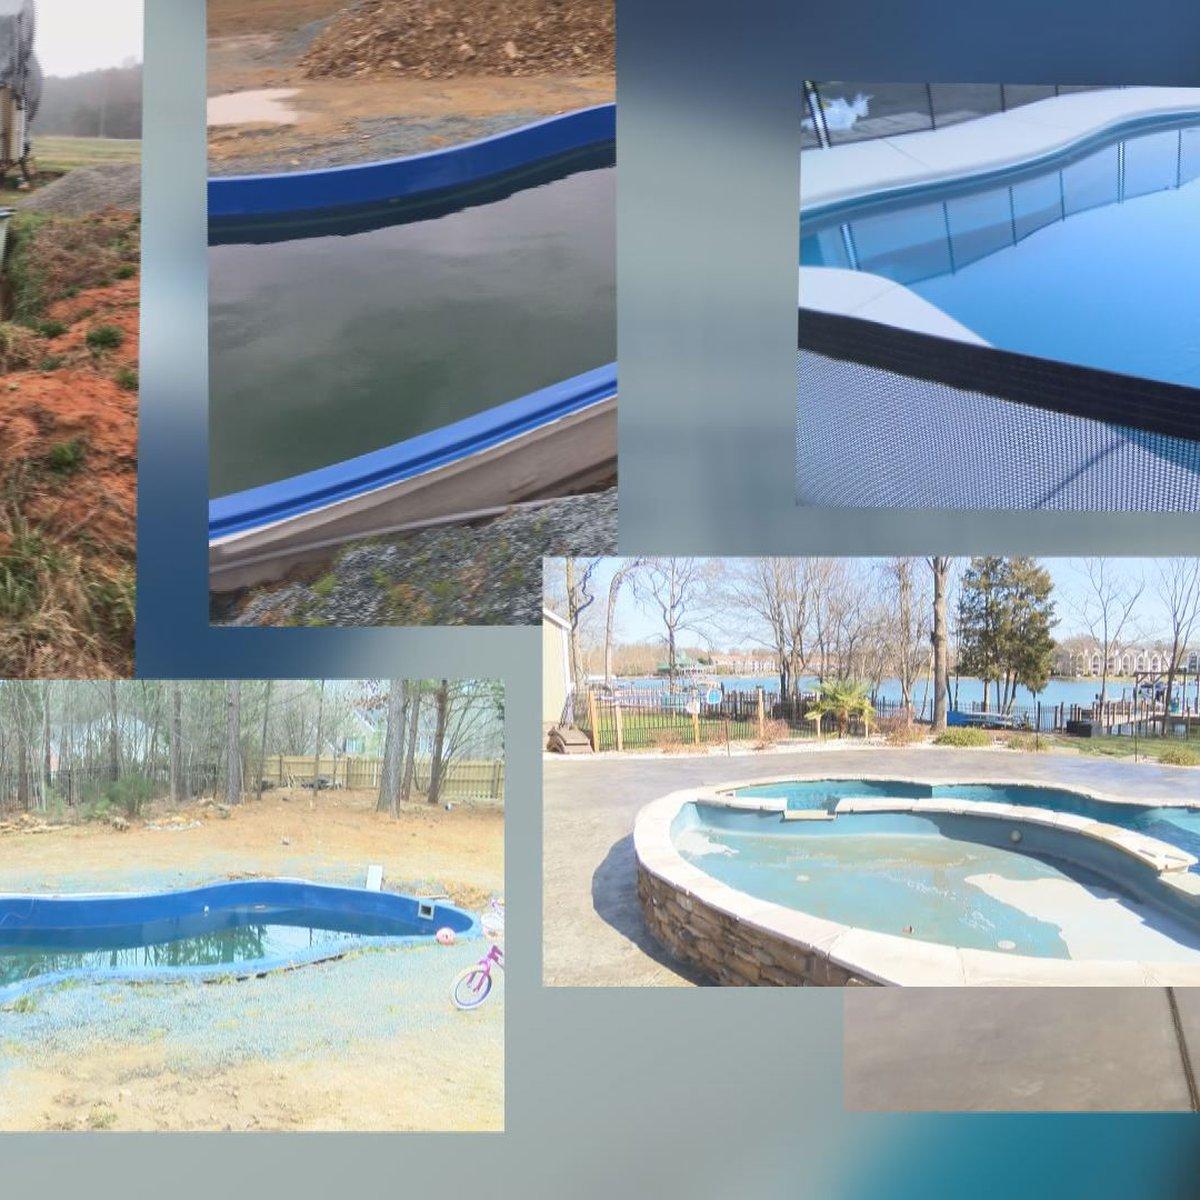 Matthews Pool Company Being Investigated After Dozens Of Customers Complain Modern backyard matthews nc